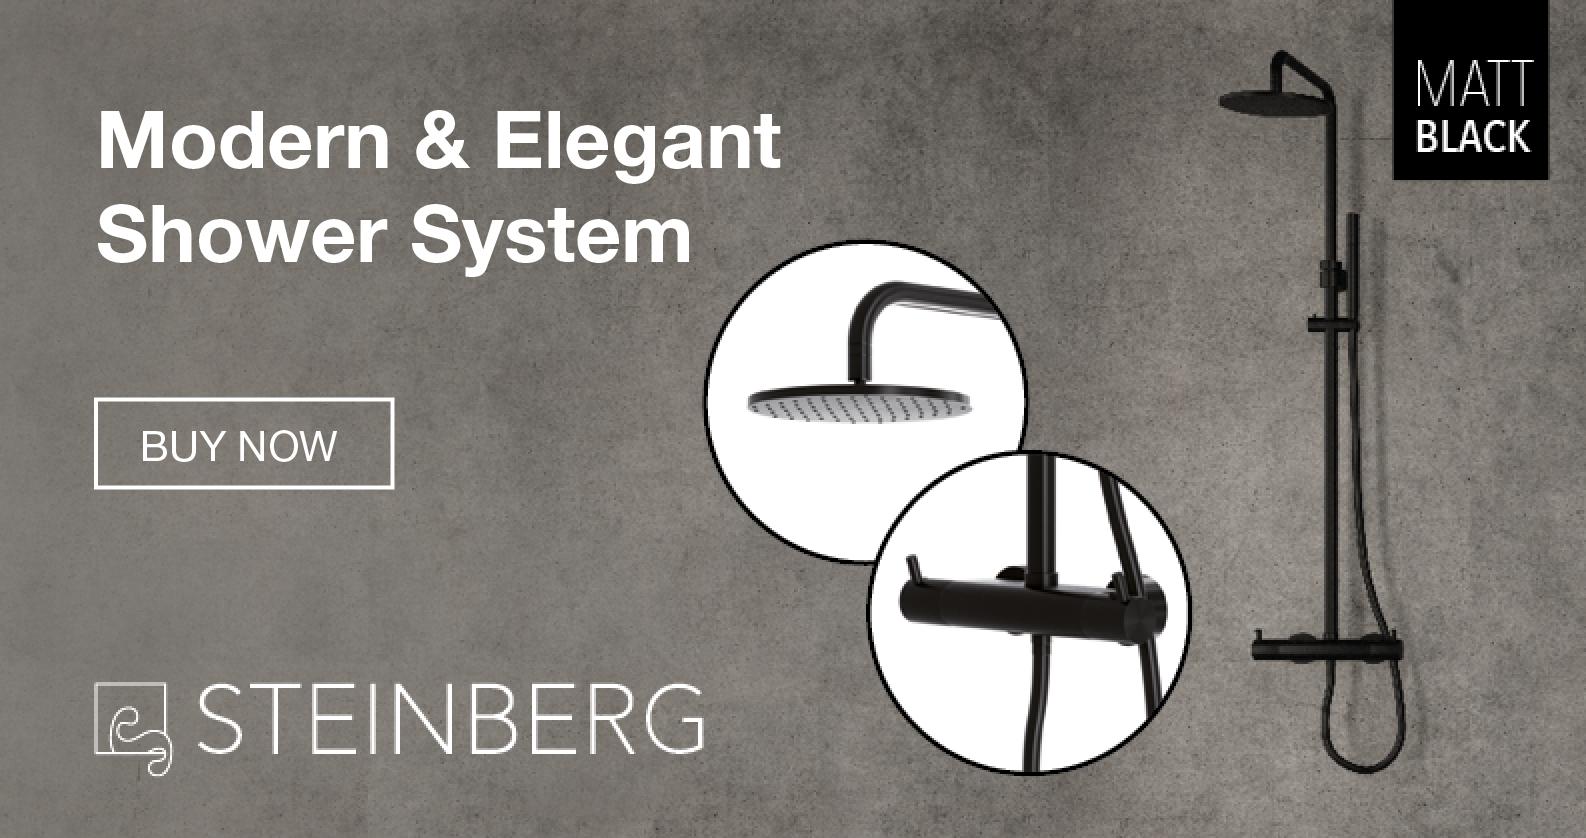 Steinberg Shower System